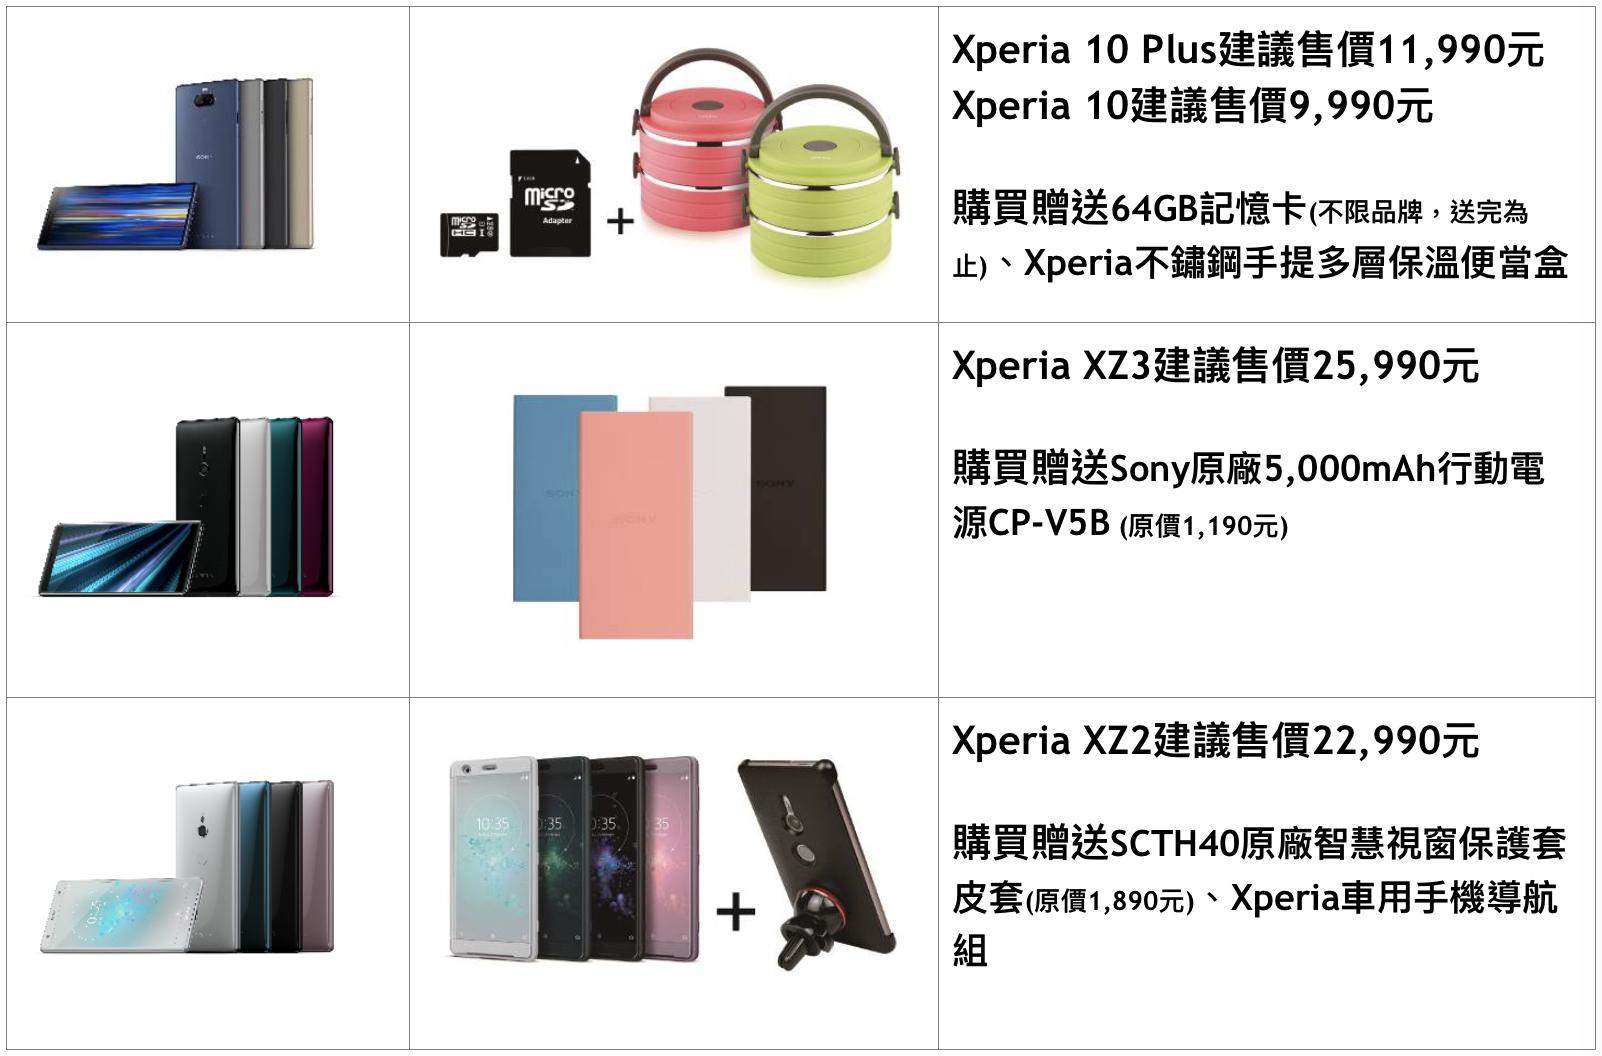 Sony 春�促銷,買 Xperia 10、XZ3、XZ2 多款限量好禮大方送